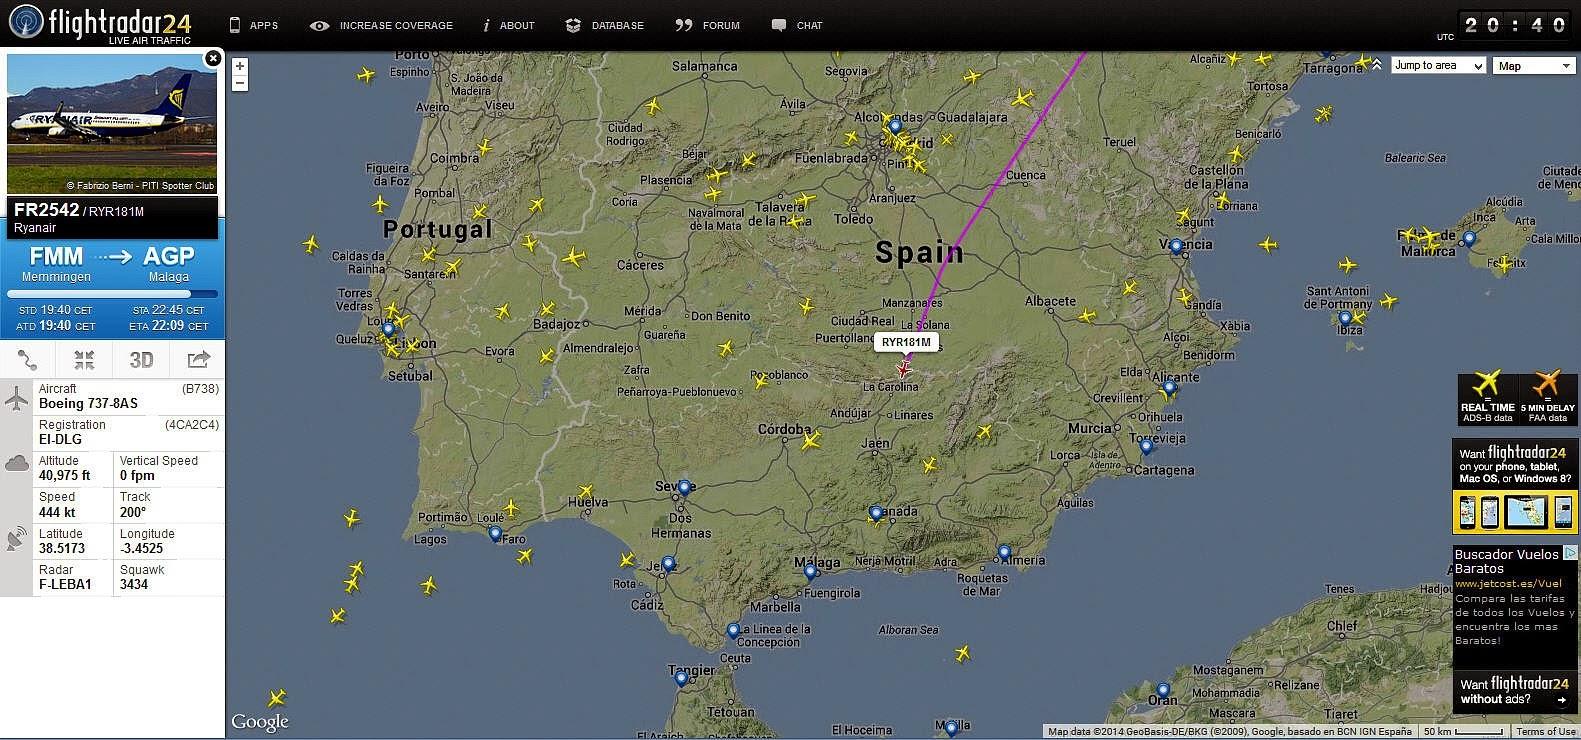 http://www.flightradar24.com/RYR181M/29517df